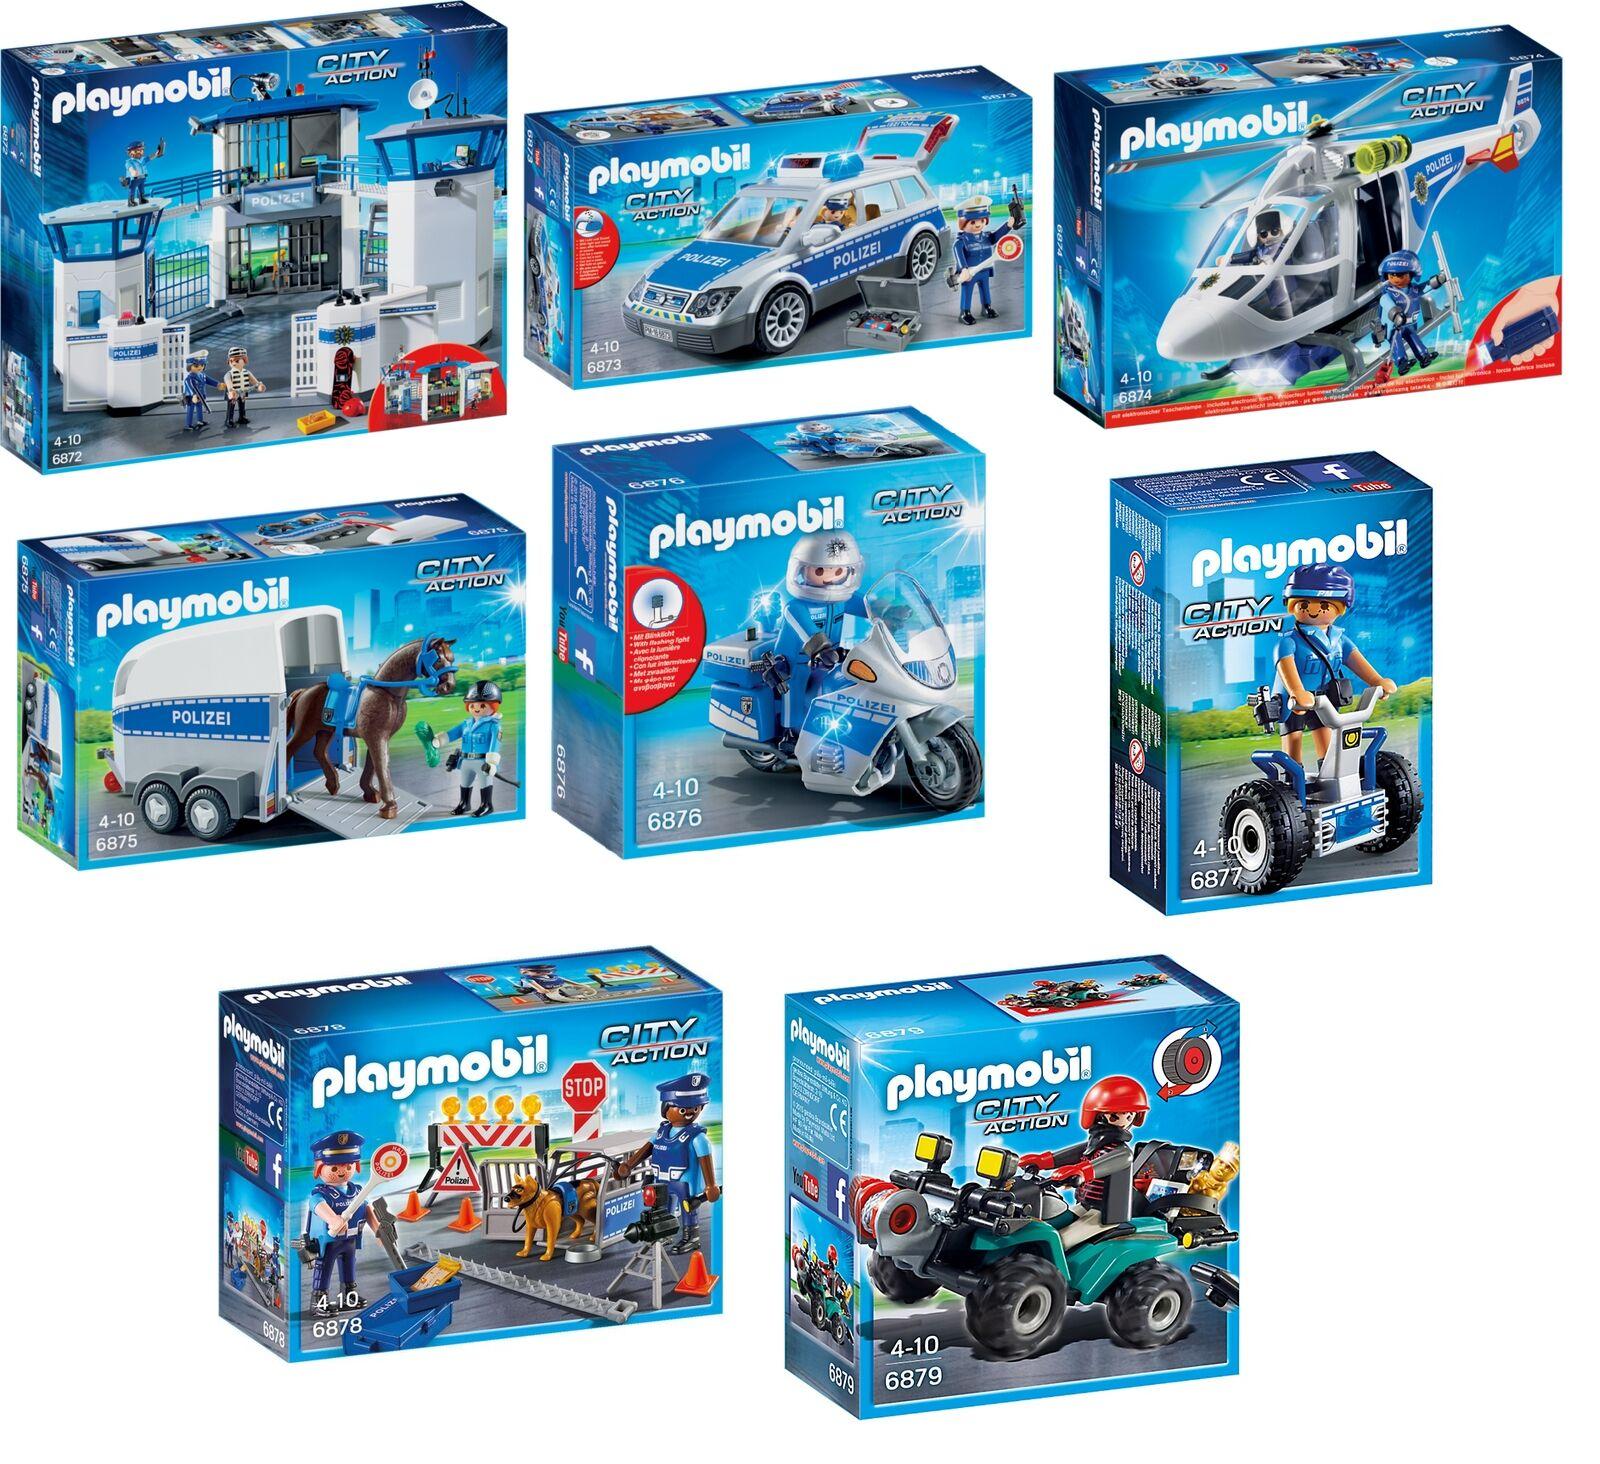 Playmobil Polizei Set 6872 6873 6874 6875 6876 6877 6878 6879